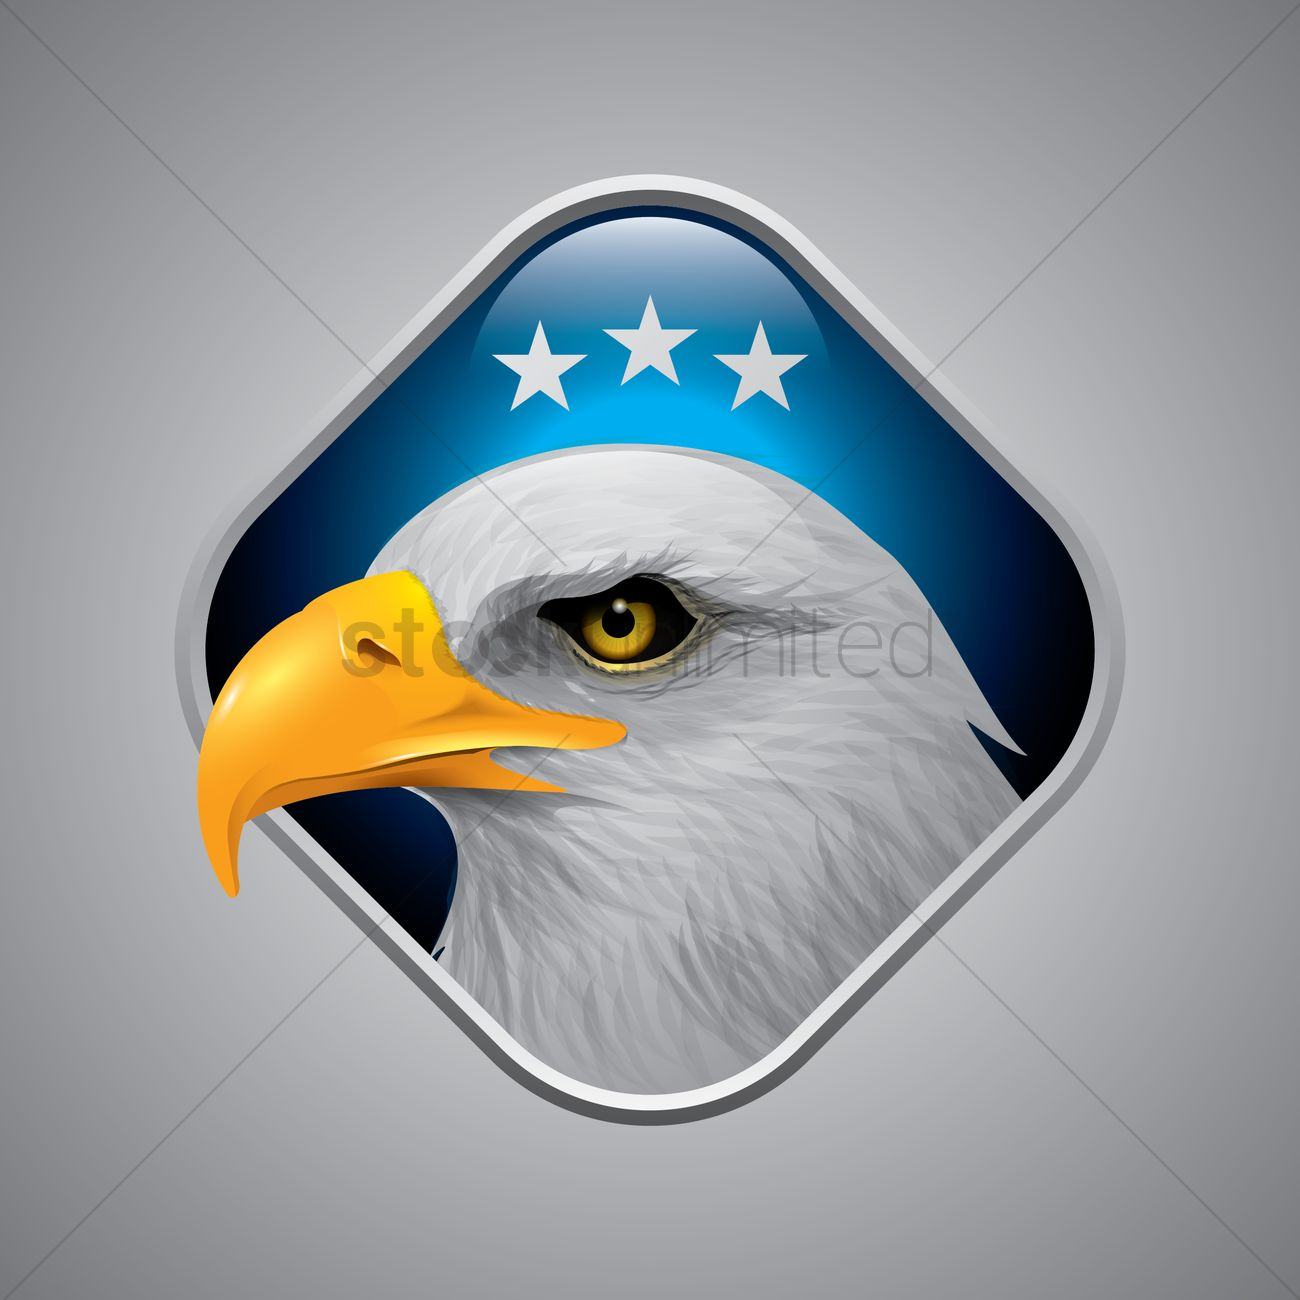 Usa Eagle Symbol Vector Image 1534503 Stockunlimited